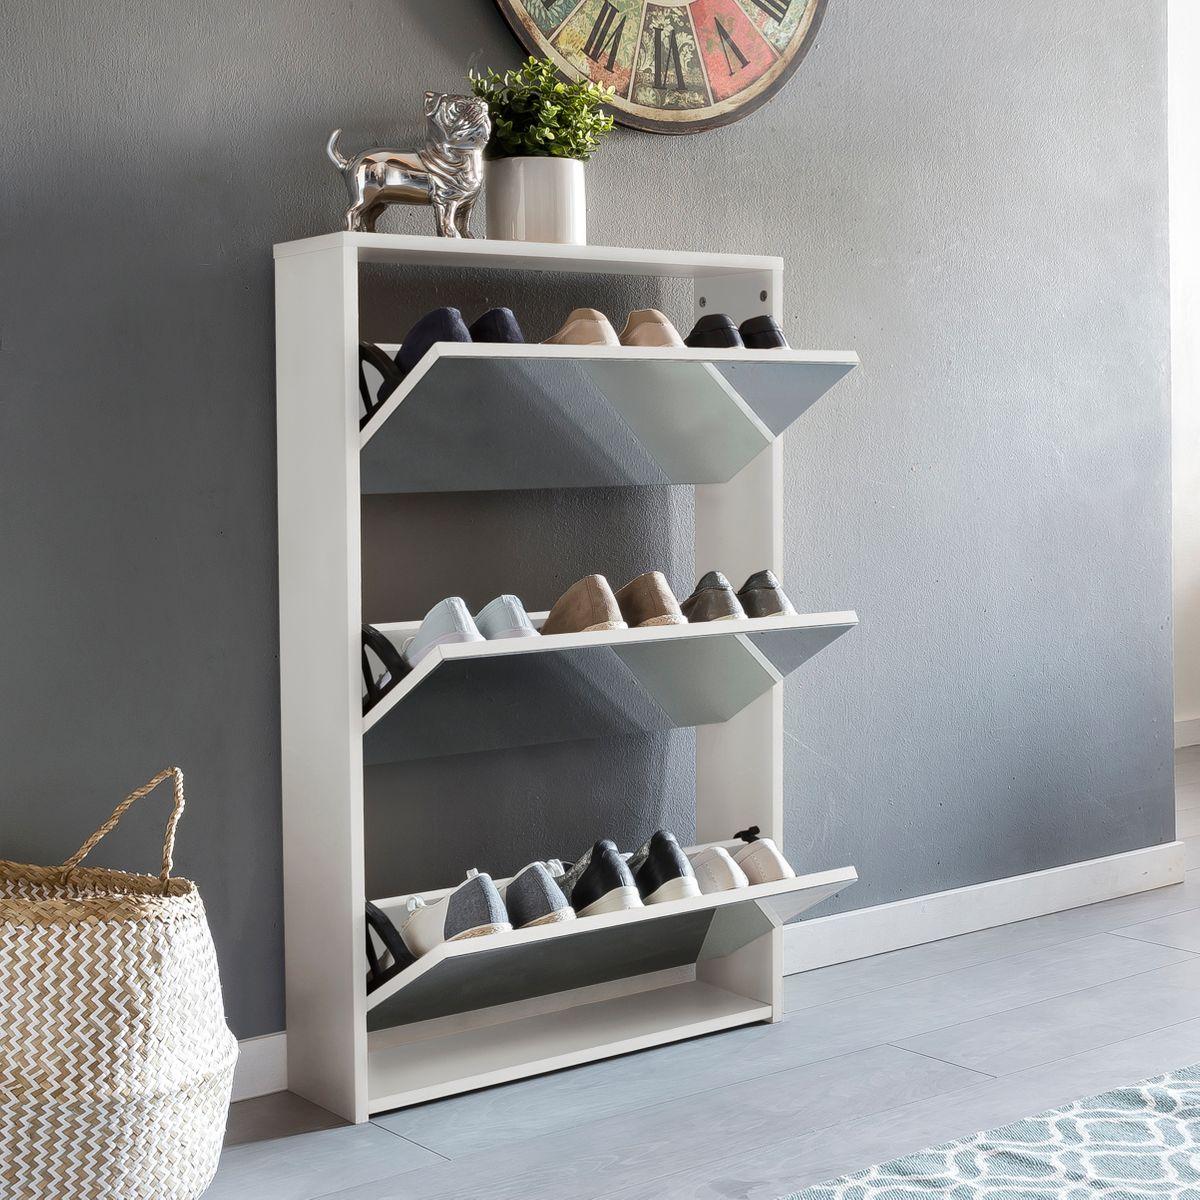 schuhkipper niki 3 klappen spiegel schuhschrank schuhregal schuhkommode holz ebay. Black Bedroom Furniture Sets. Home Design Ideas